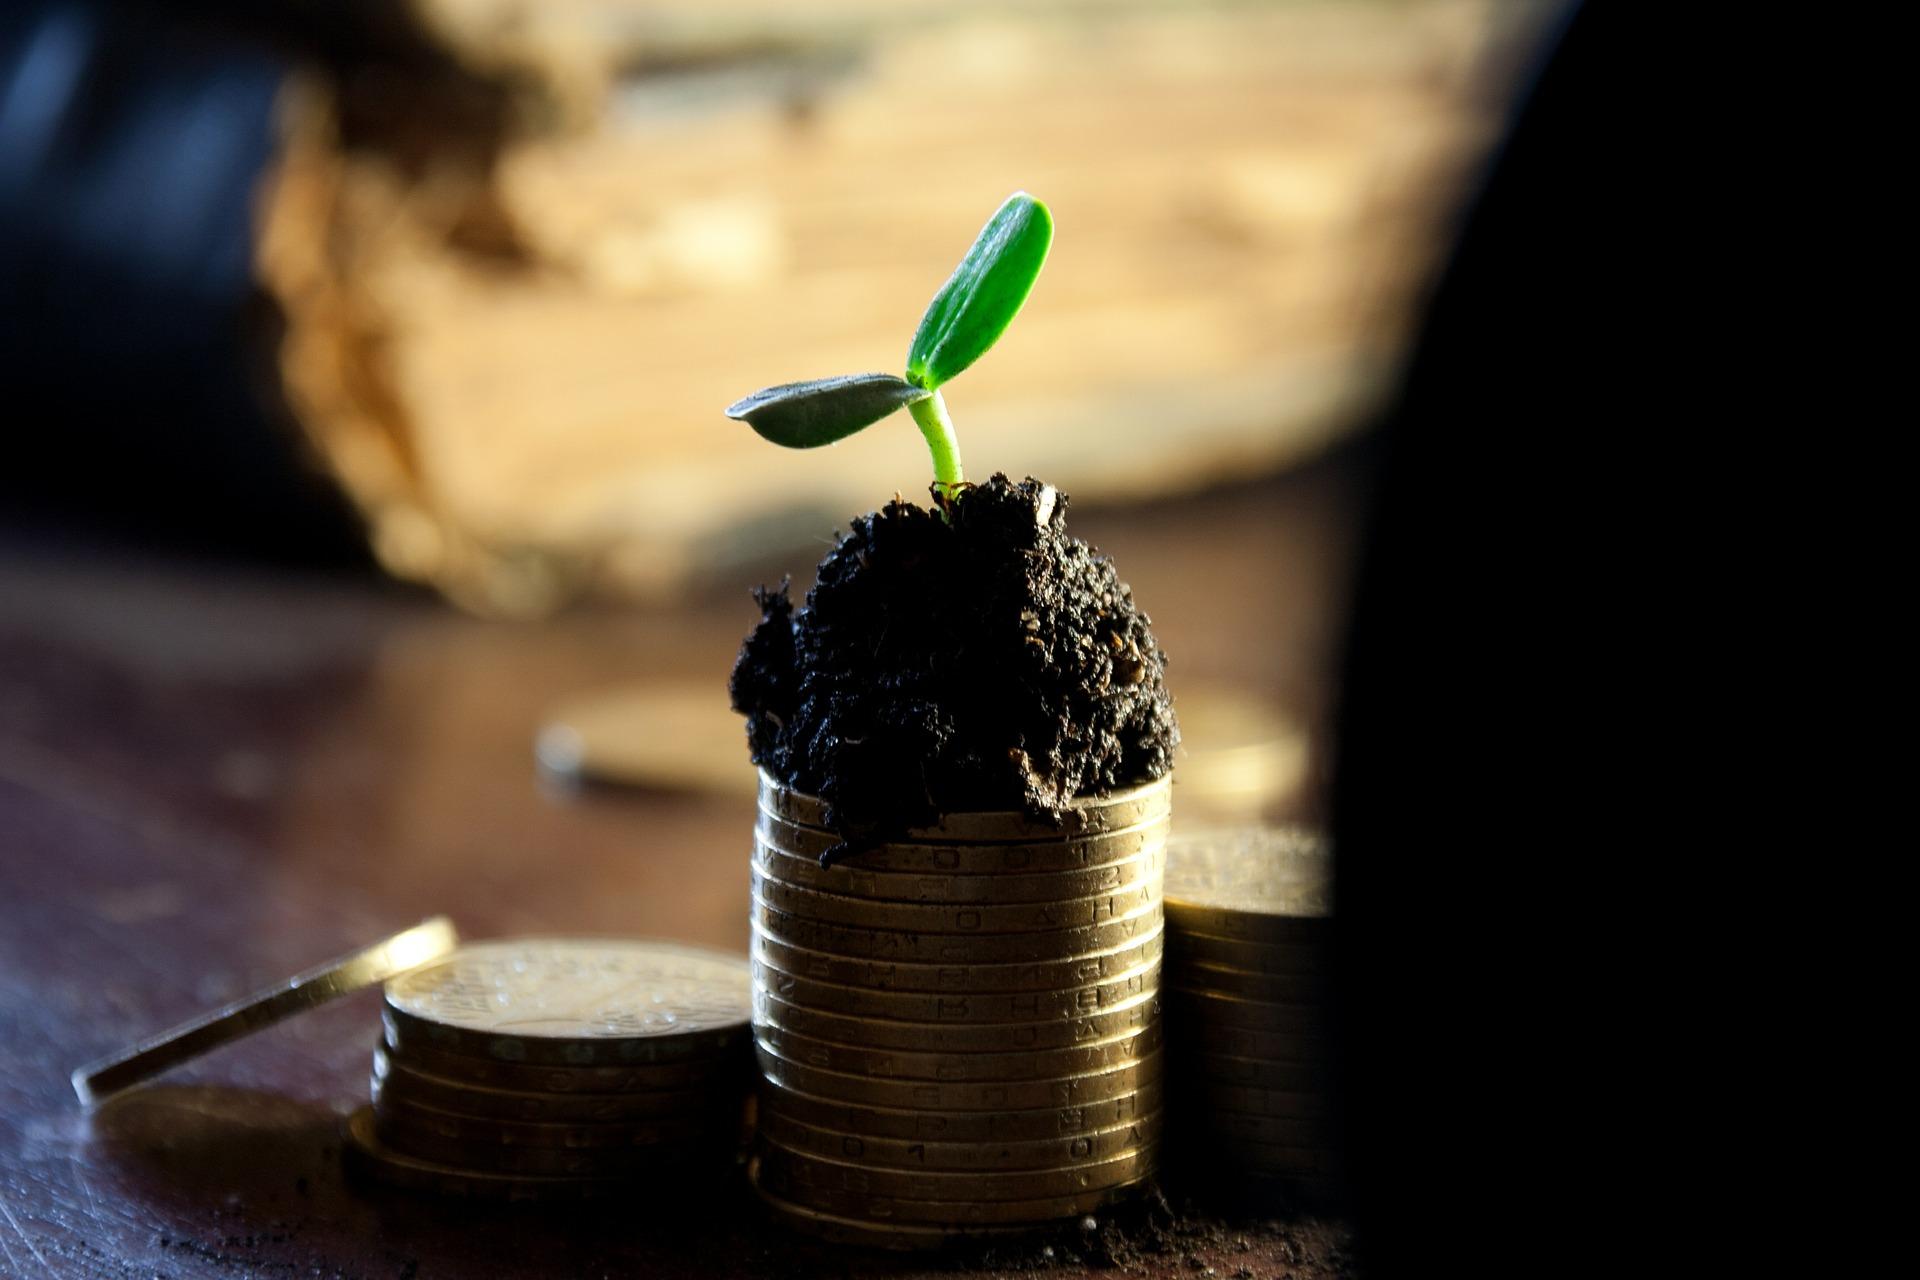 horoscop saptamanal bani -sfatulparintilor.ro- pixabay_com- money-549161_1920